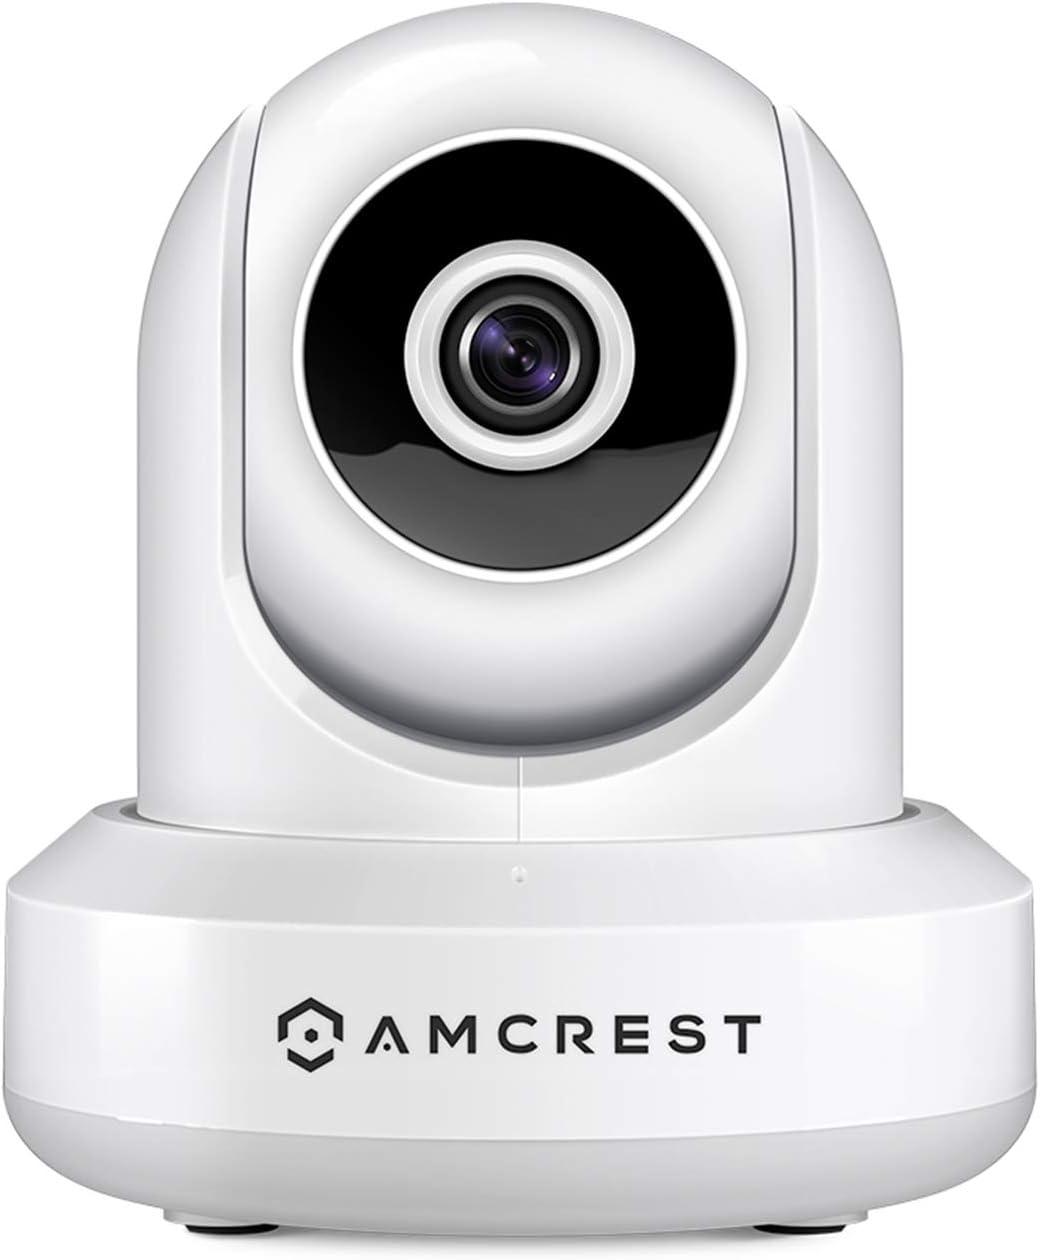 Amcrest ProHD 1080P POE (Power Over Ethernet) IP Camera